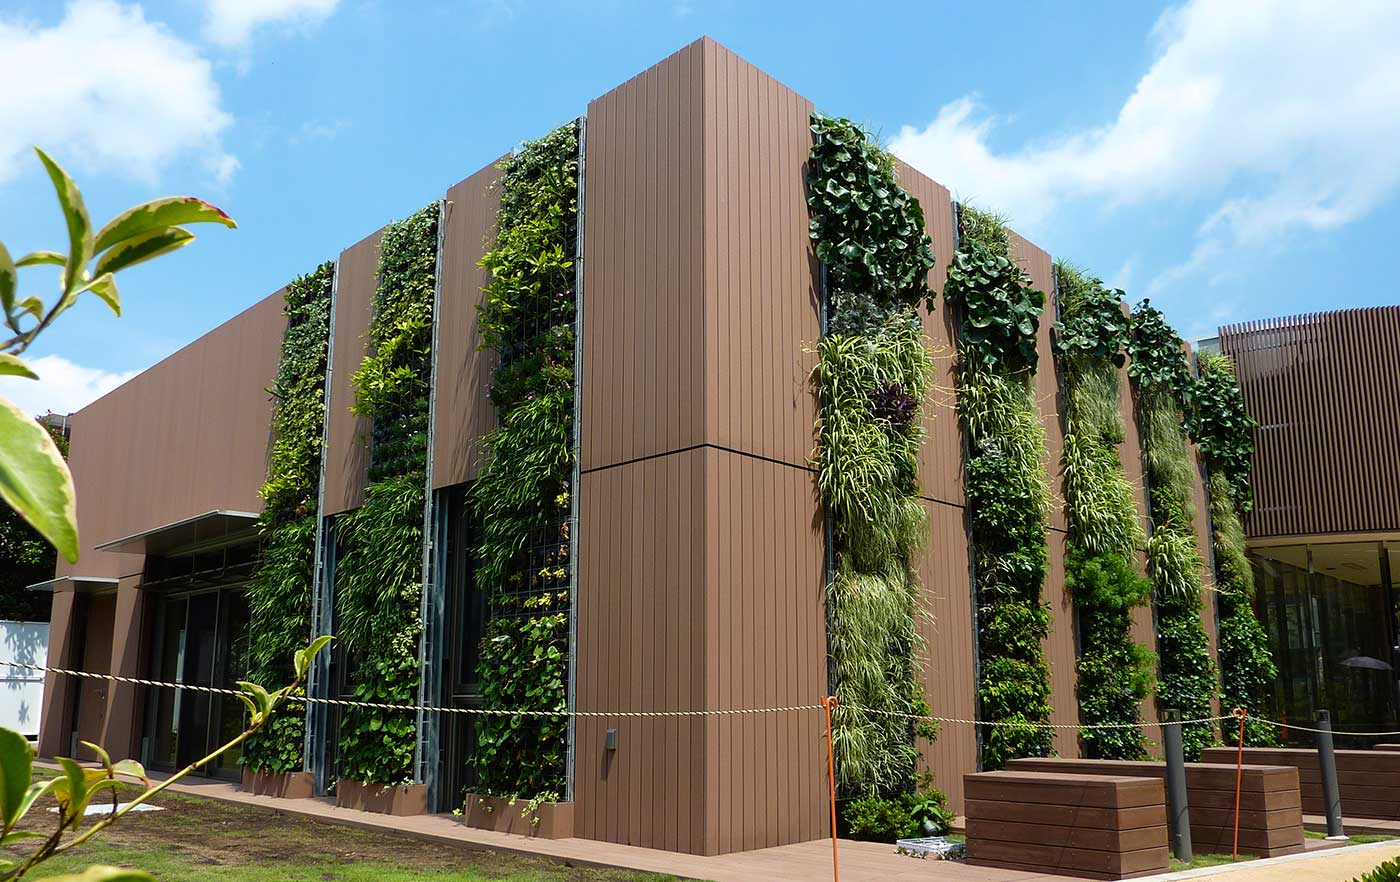 Jardines verticales canevaflor jardines verticales for Muros y fachadas verdes jardines verticales